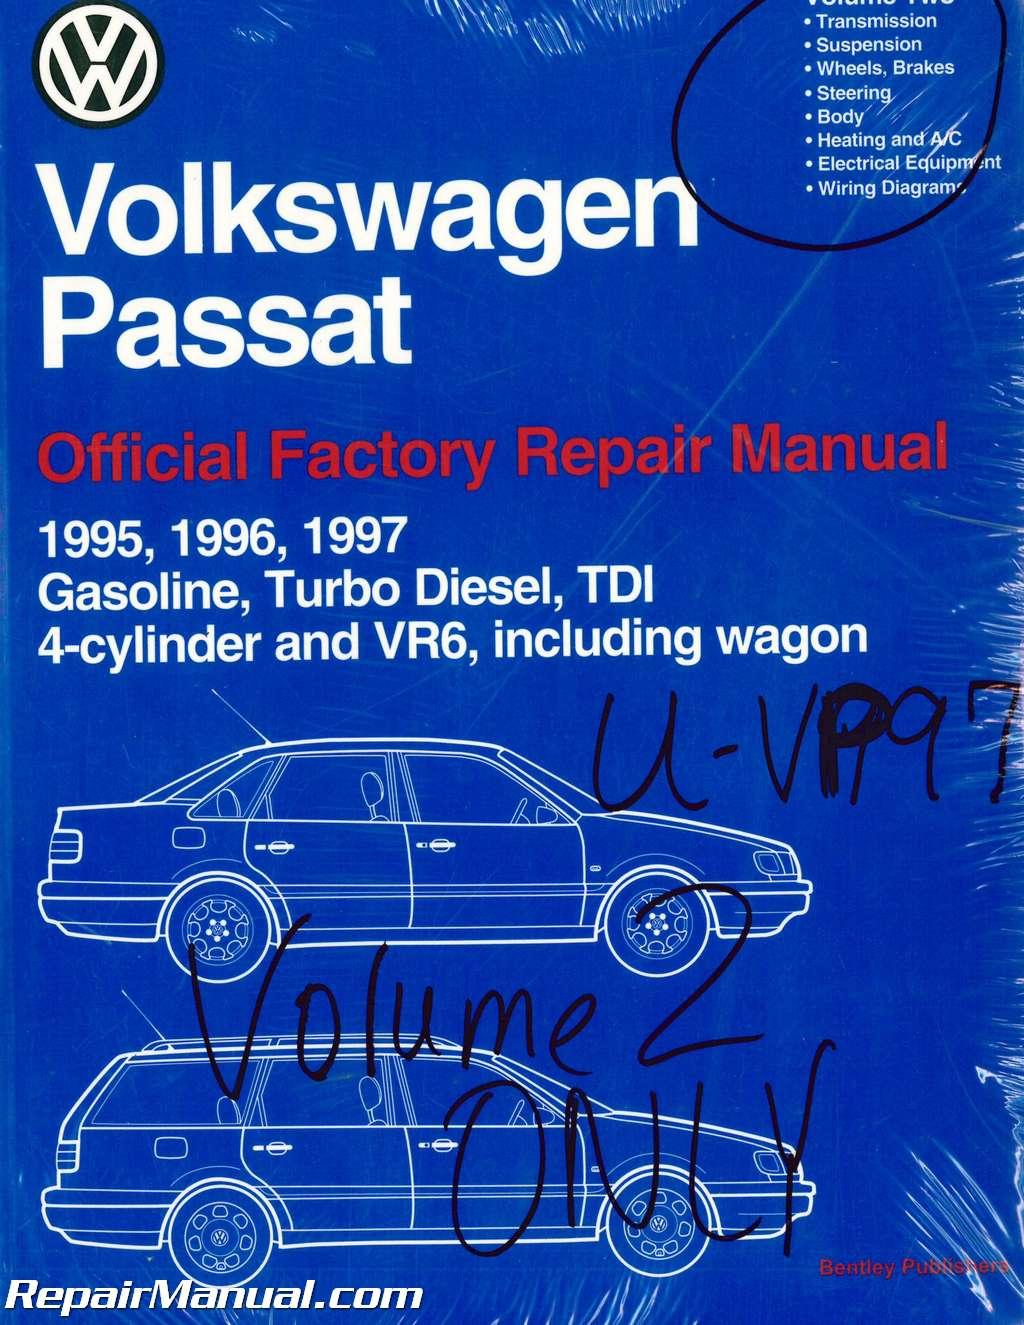 GB_9805] Of 1993 Vw Passat Wiring Diagram Automotive Wiring DiagramsTerch Dimet Mecad Elae Mohammedshrine Librar Wiring 101